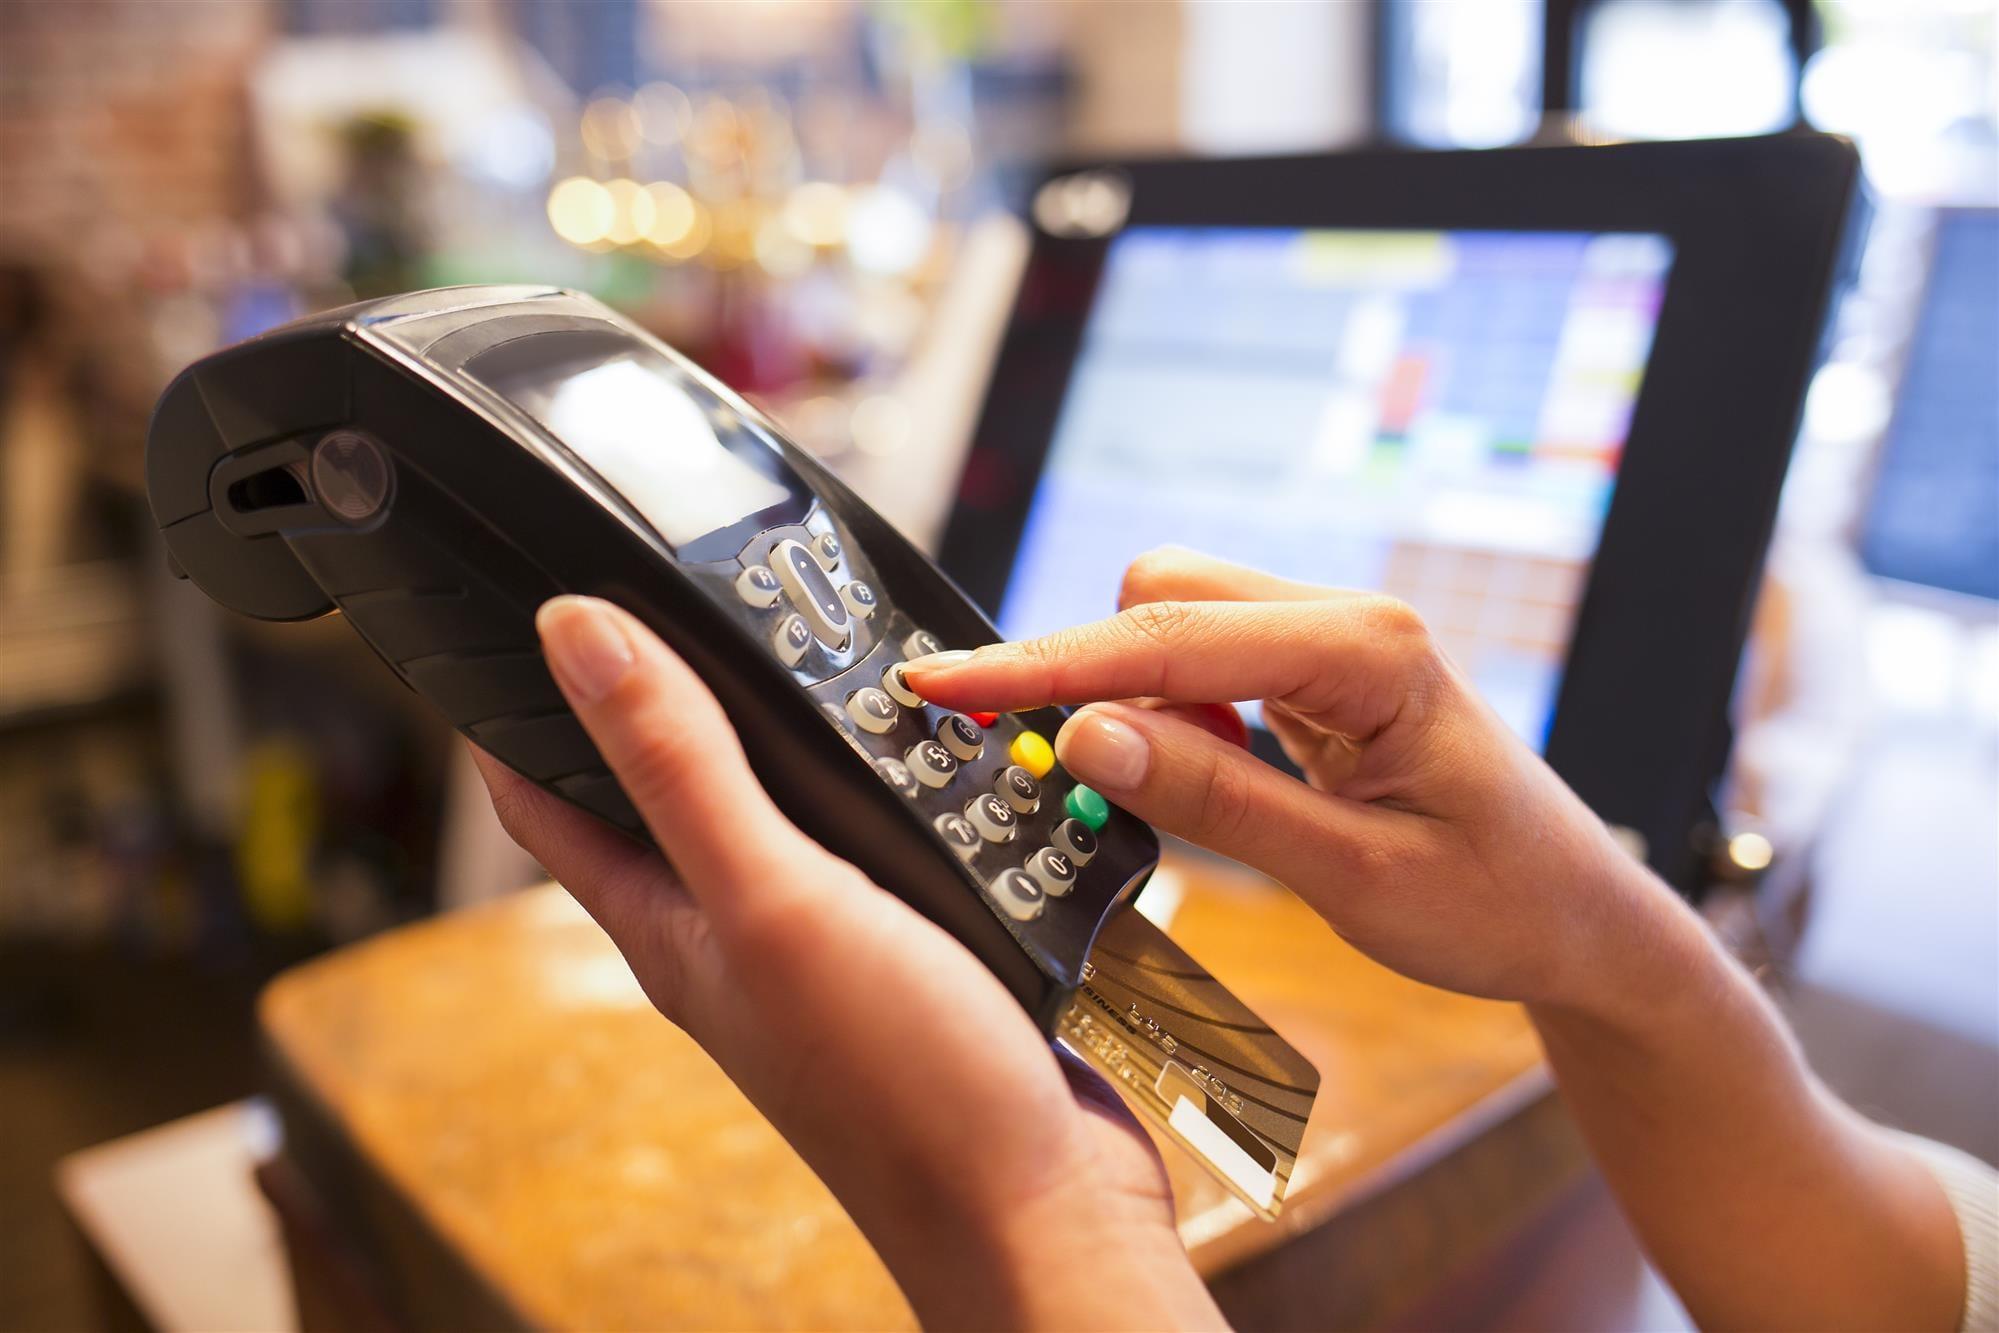 Credit Cards machine